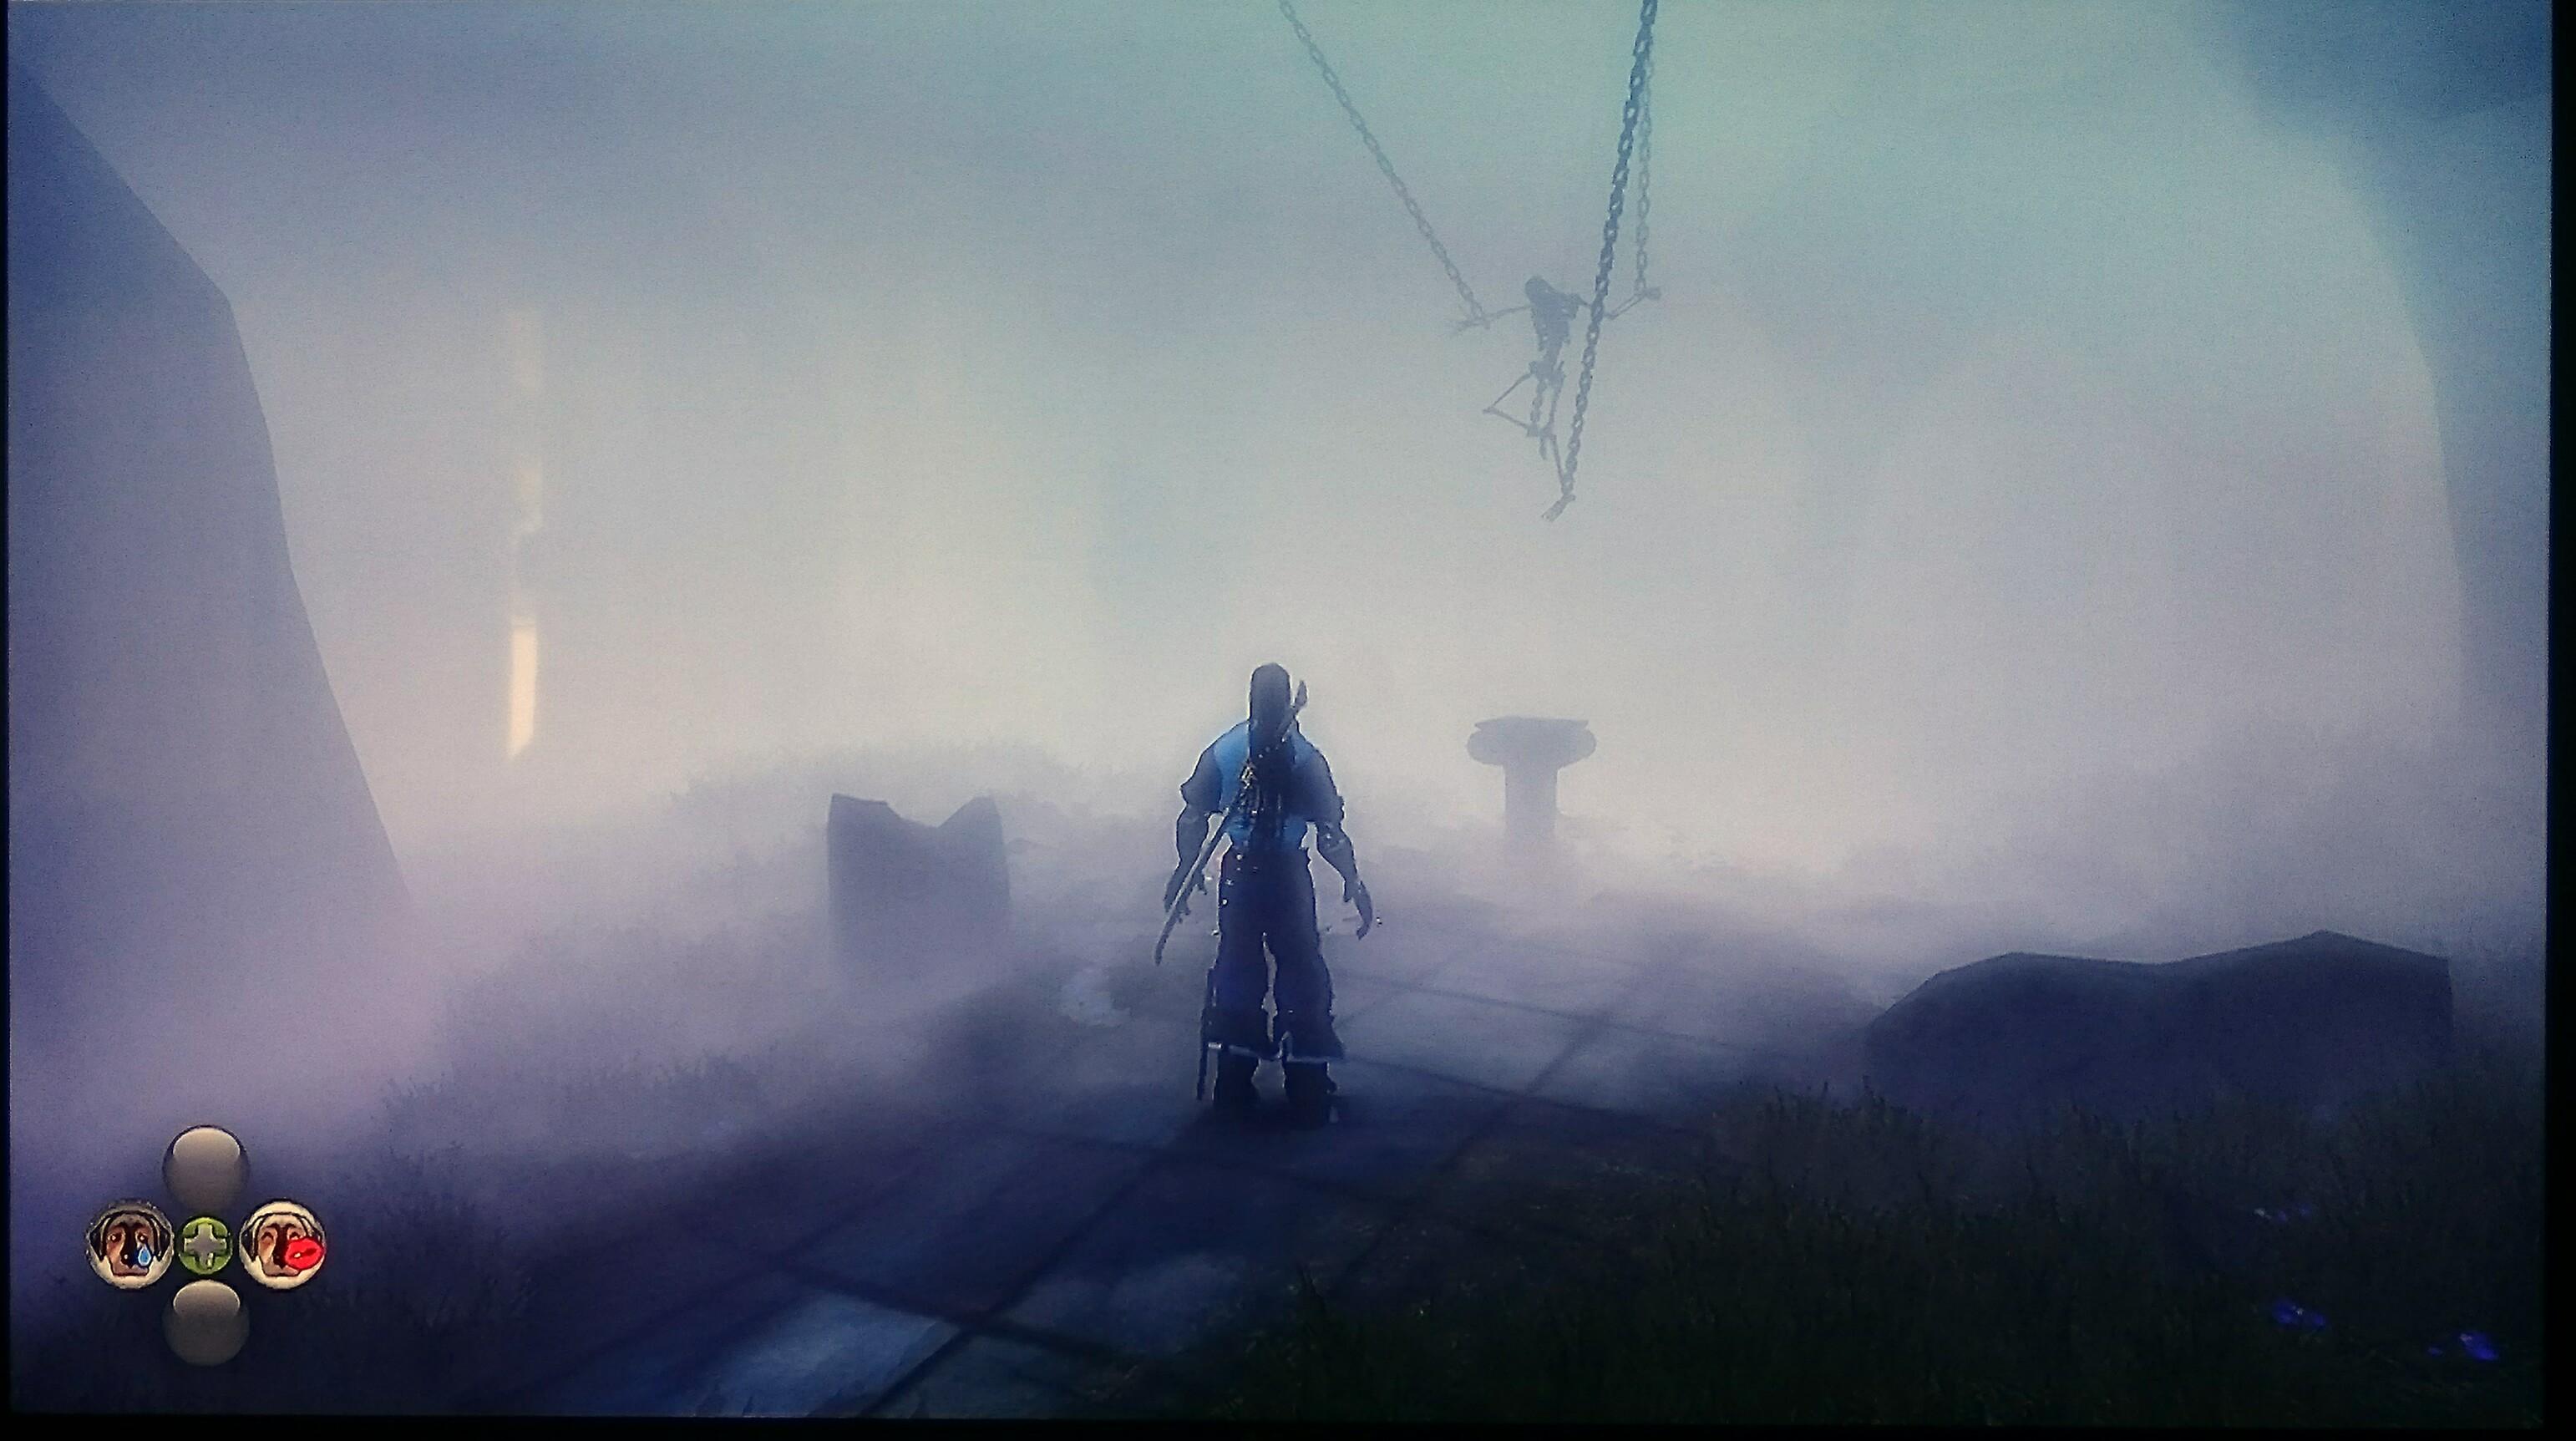 Mirror's Mist